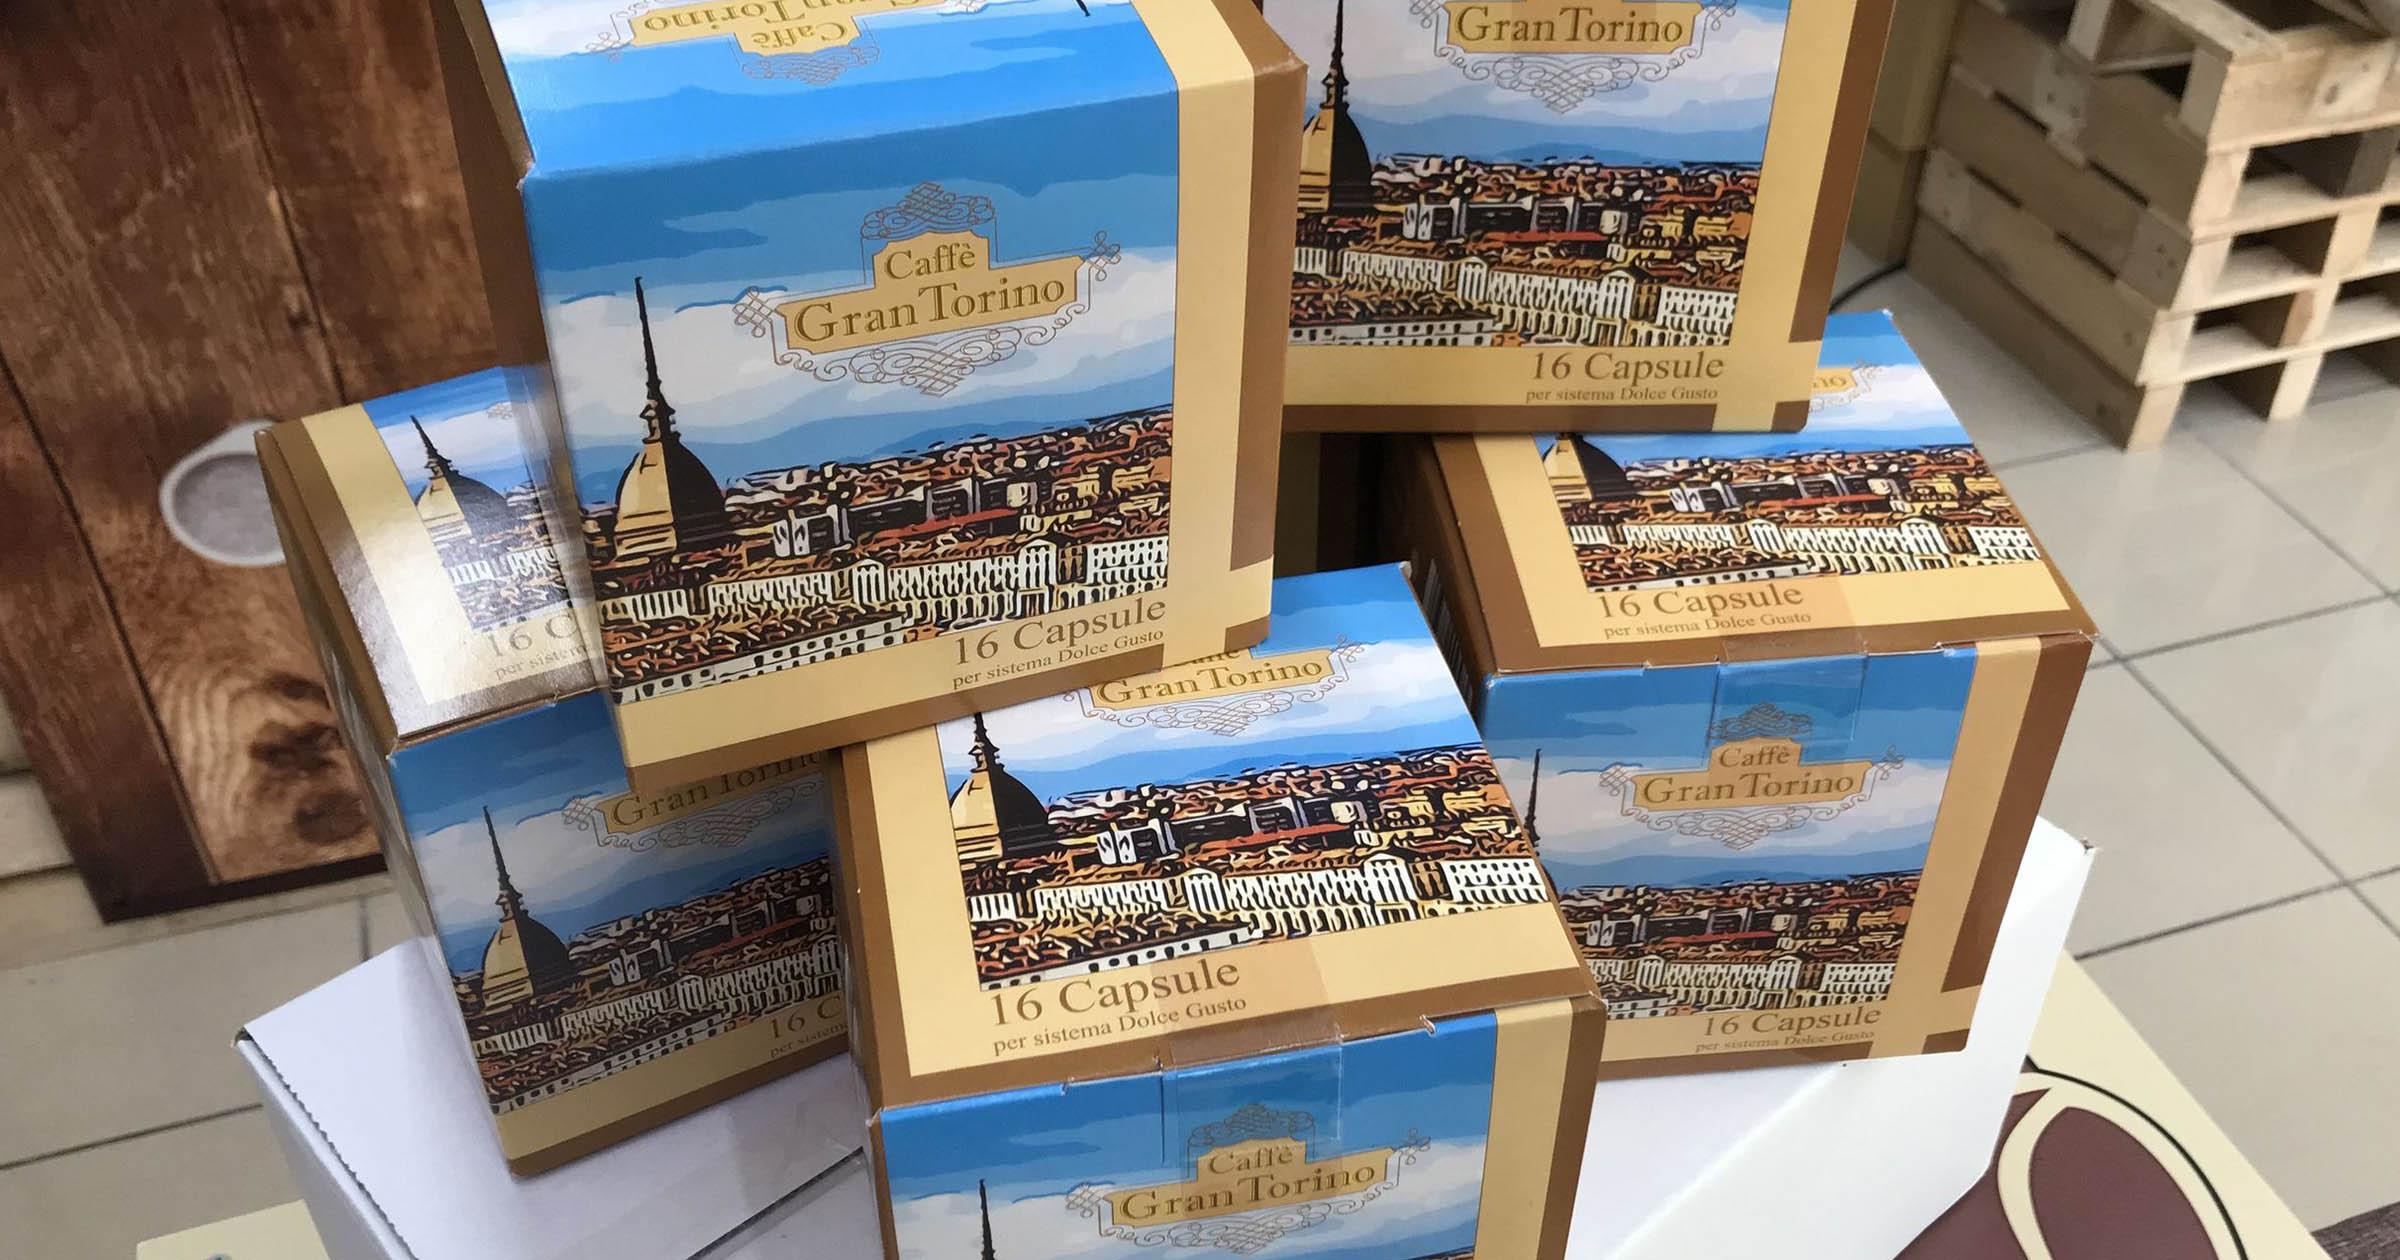 oferta Gran Torino